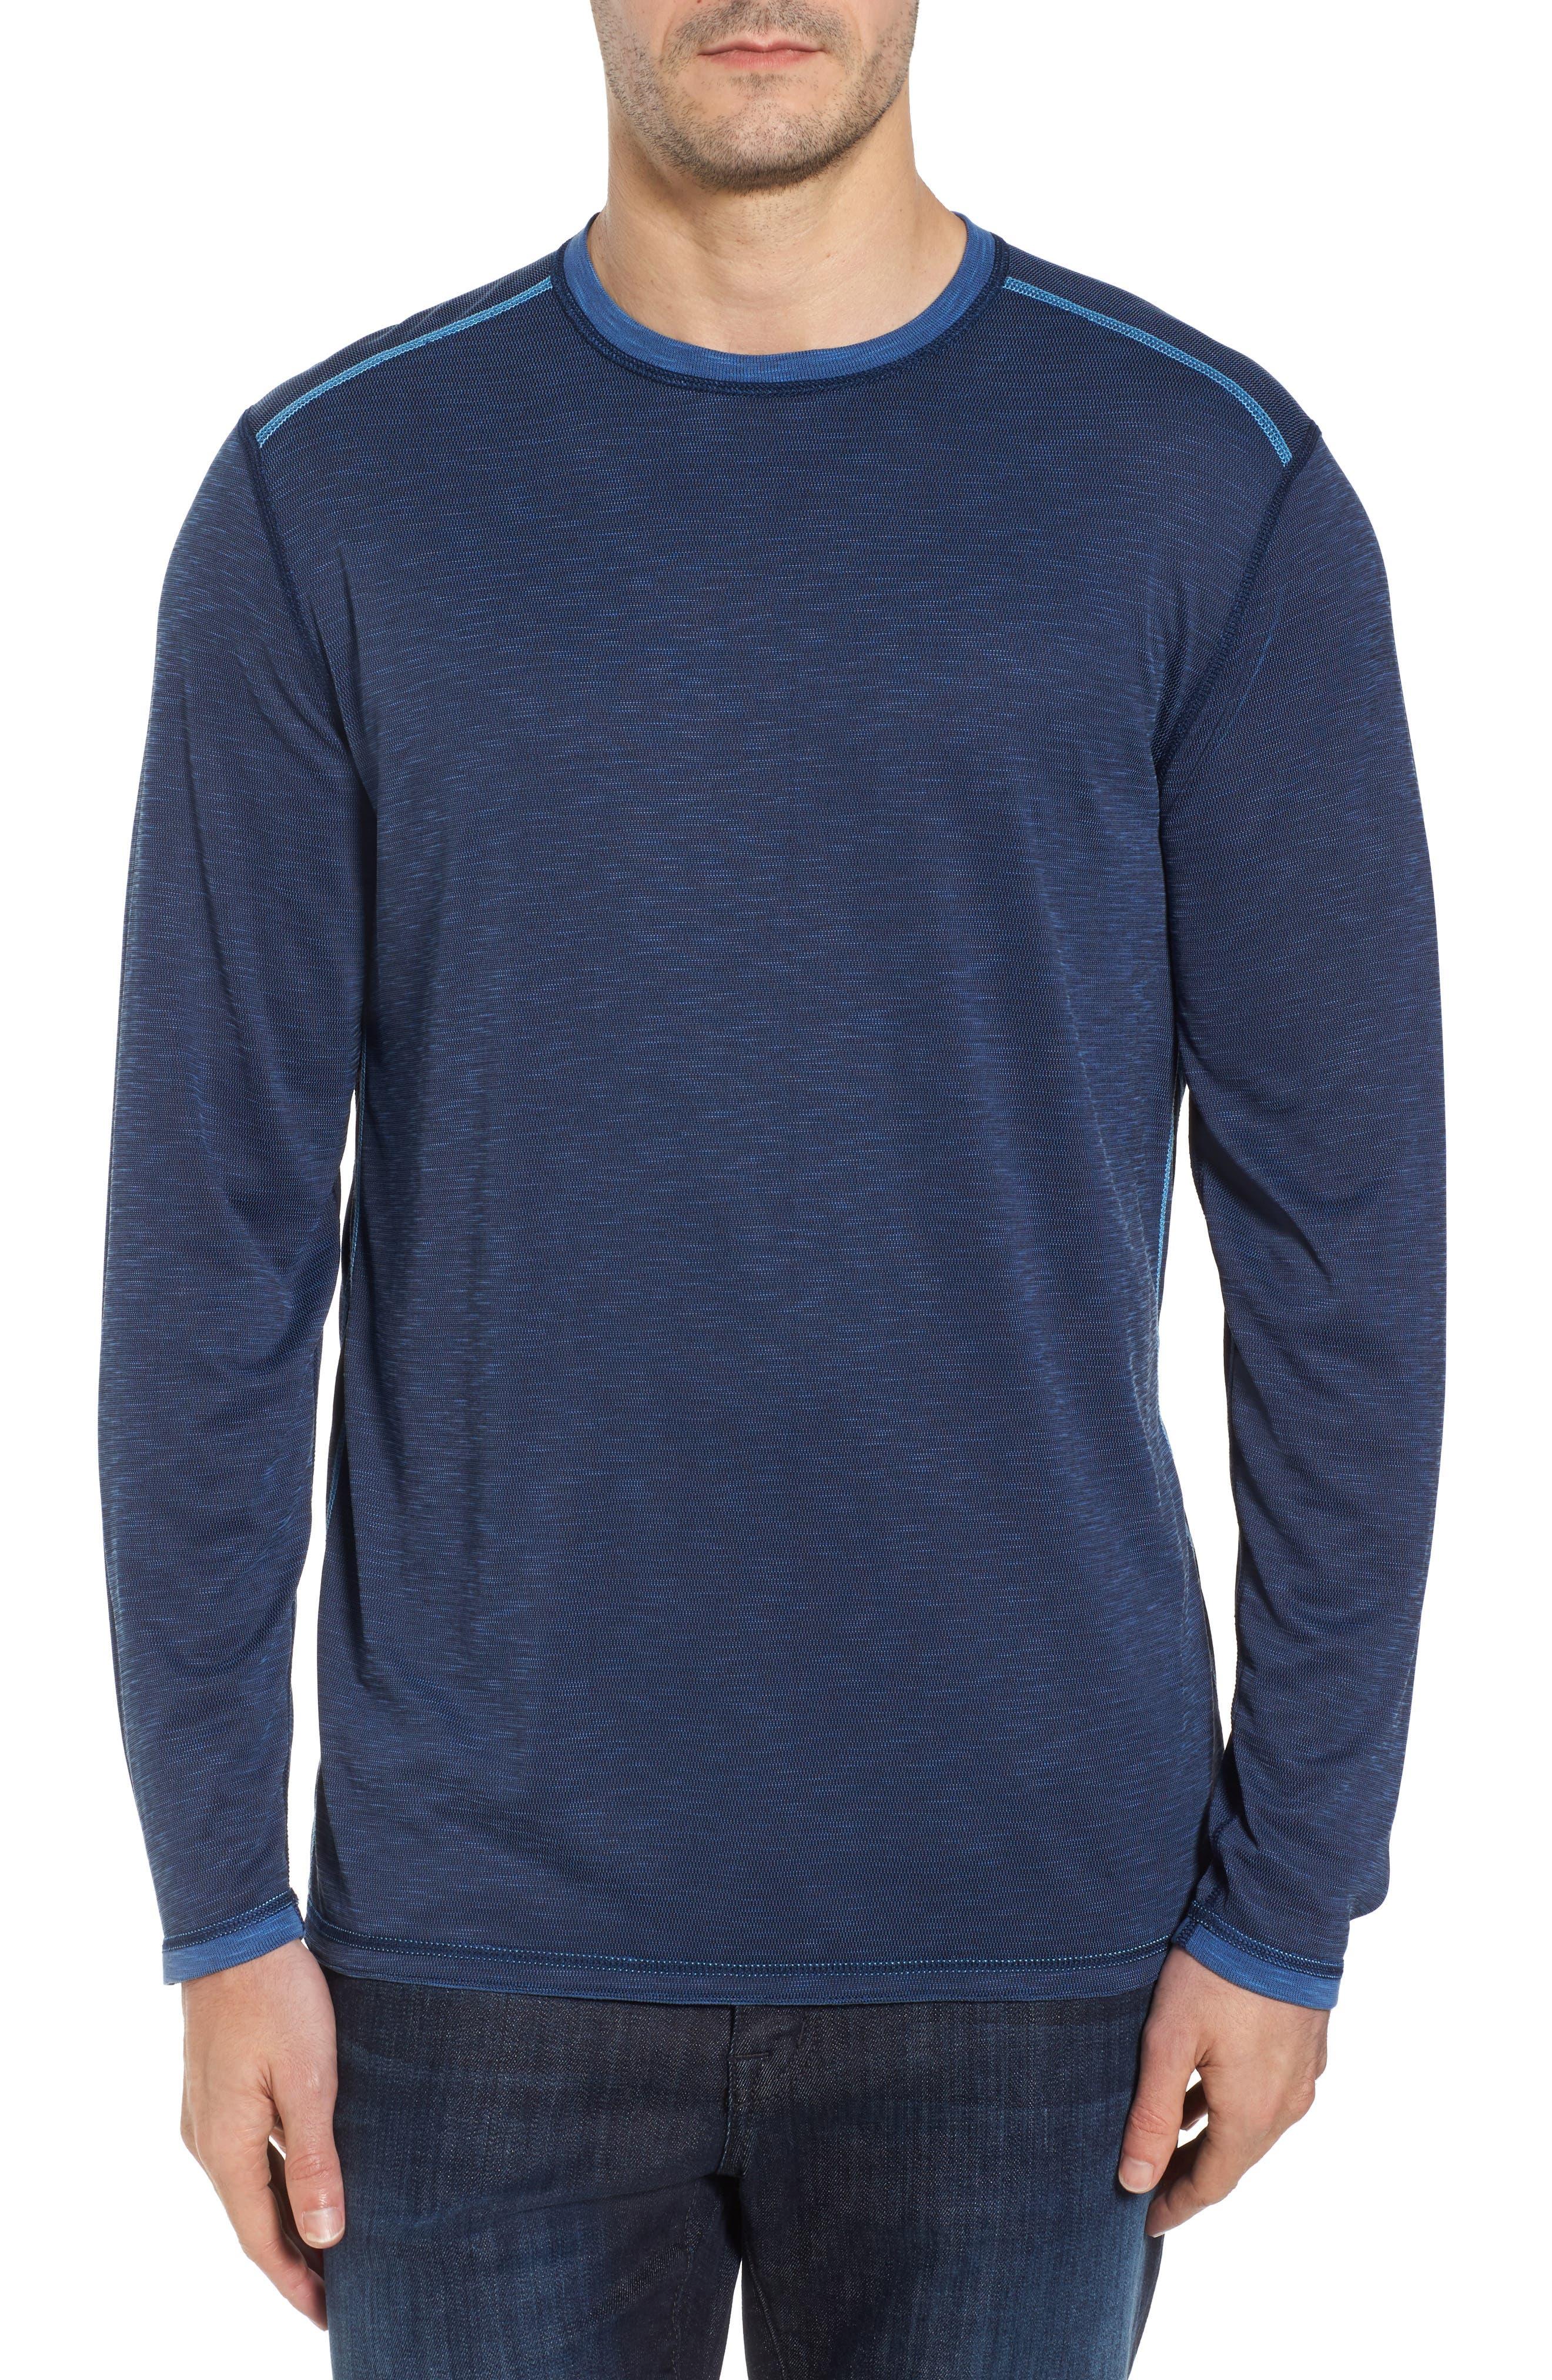 Flip Tide Standard Fit T-Shirt,                             Alternate thumbnail 2, color,                             GALAXY BLUE